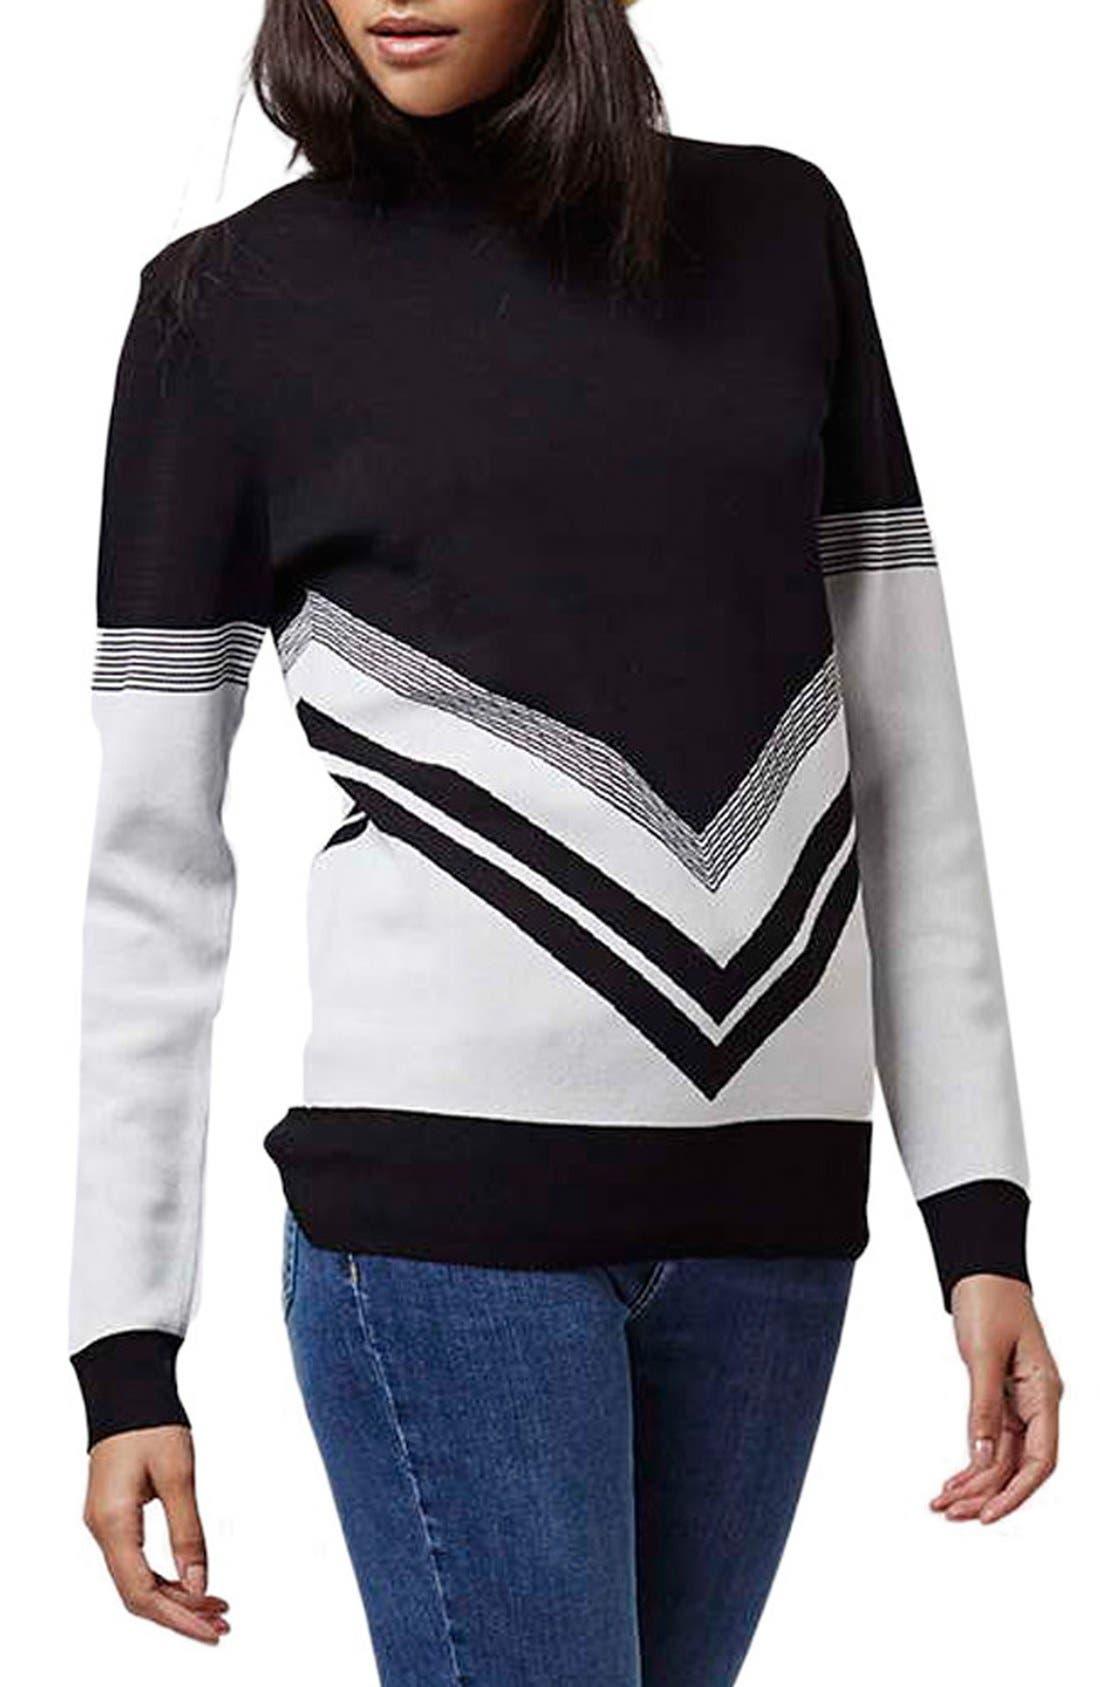 Alternate Image 1 Selected - Topshop Chevron Colorblock Sweater